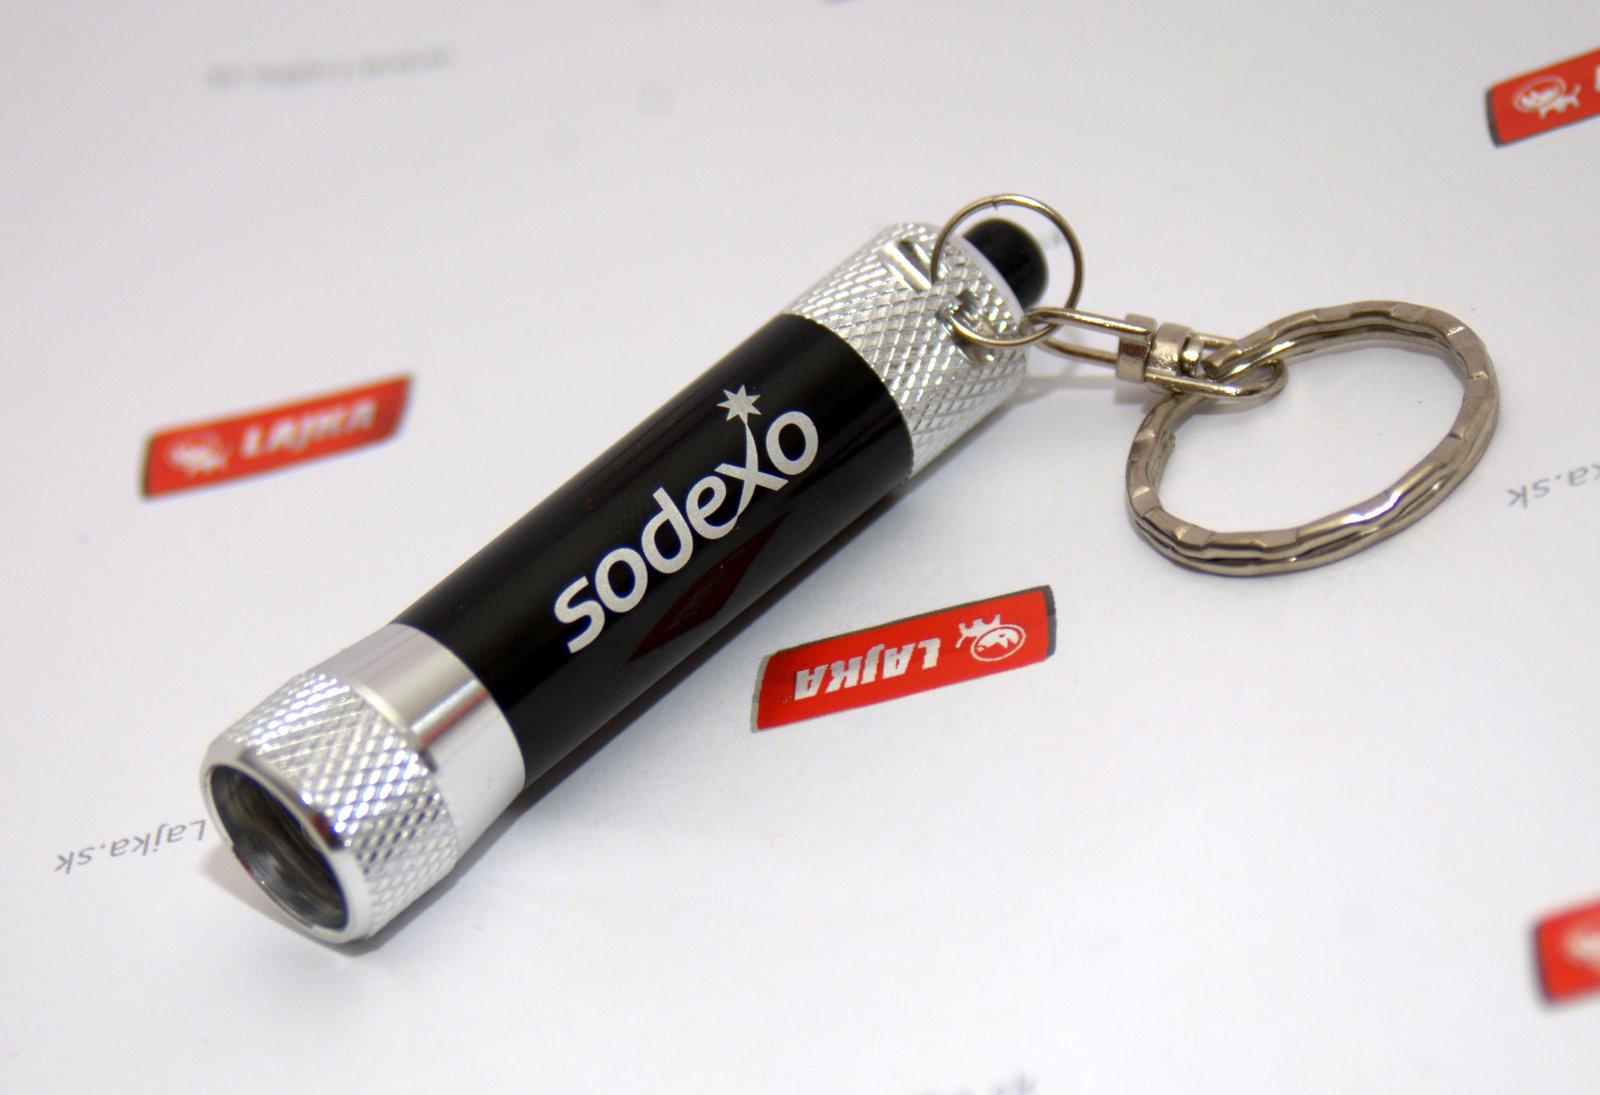 Kľúčenka s baterkou vygravírovaným logom 84f64c7c9ba